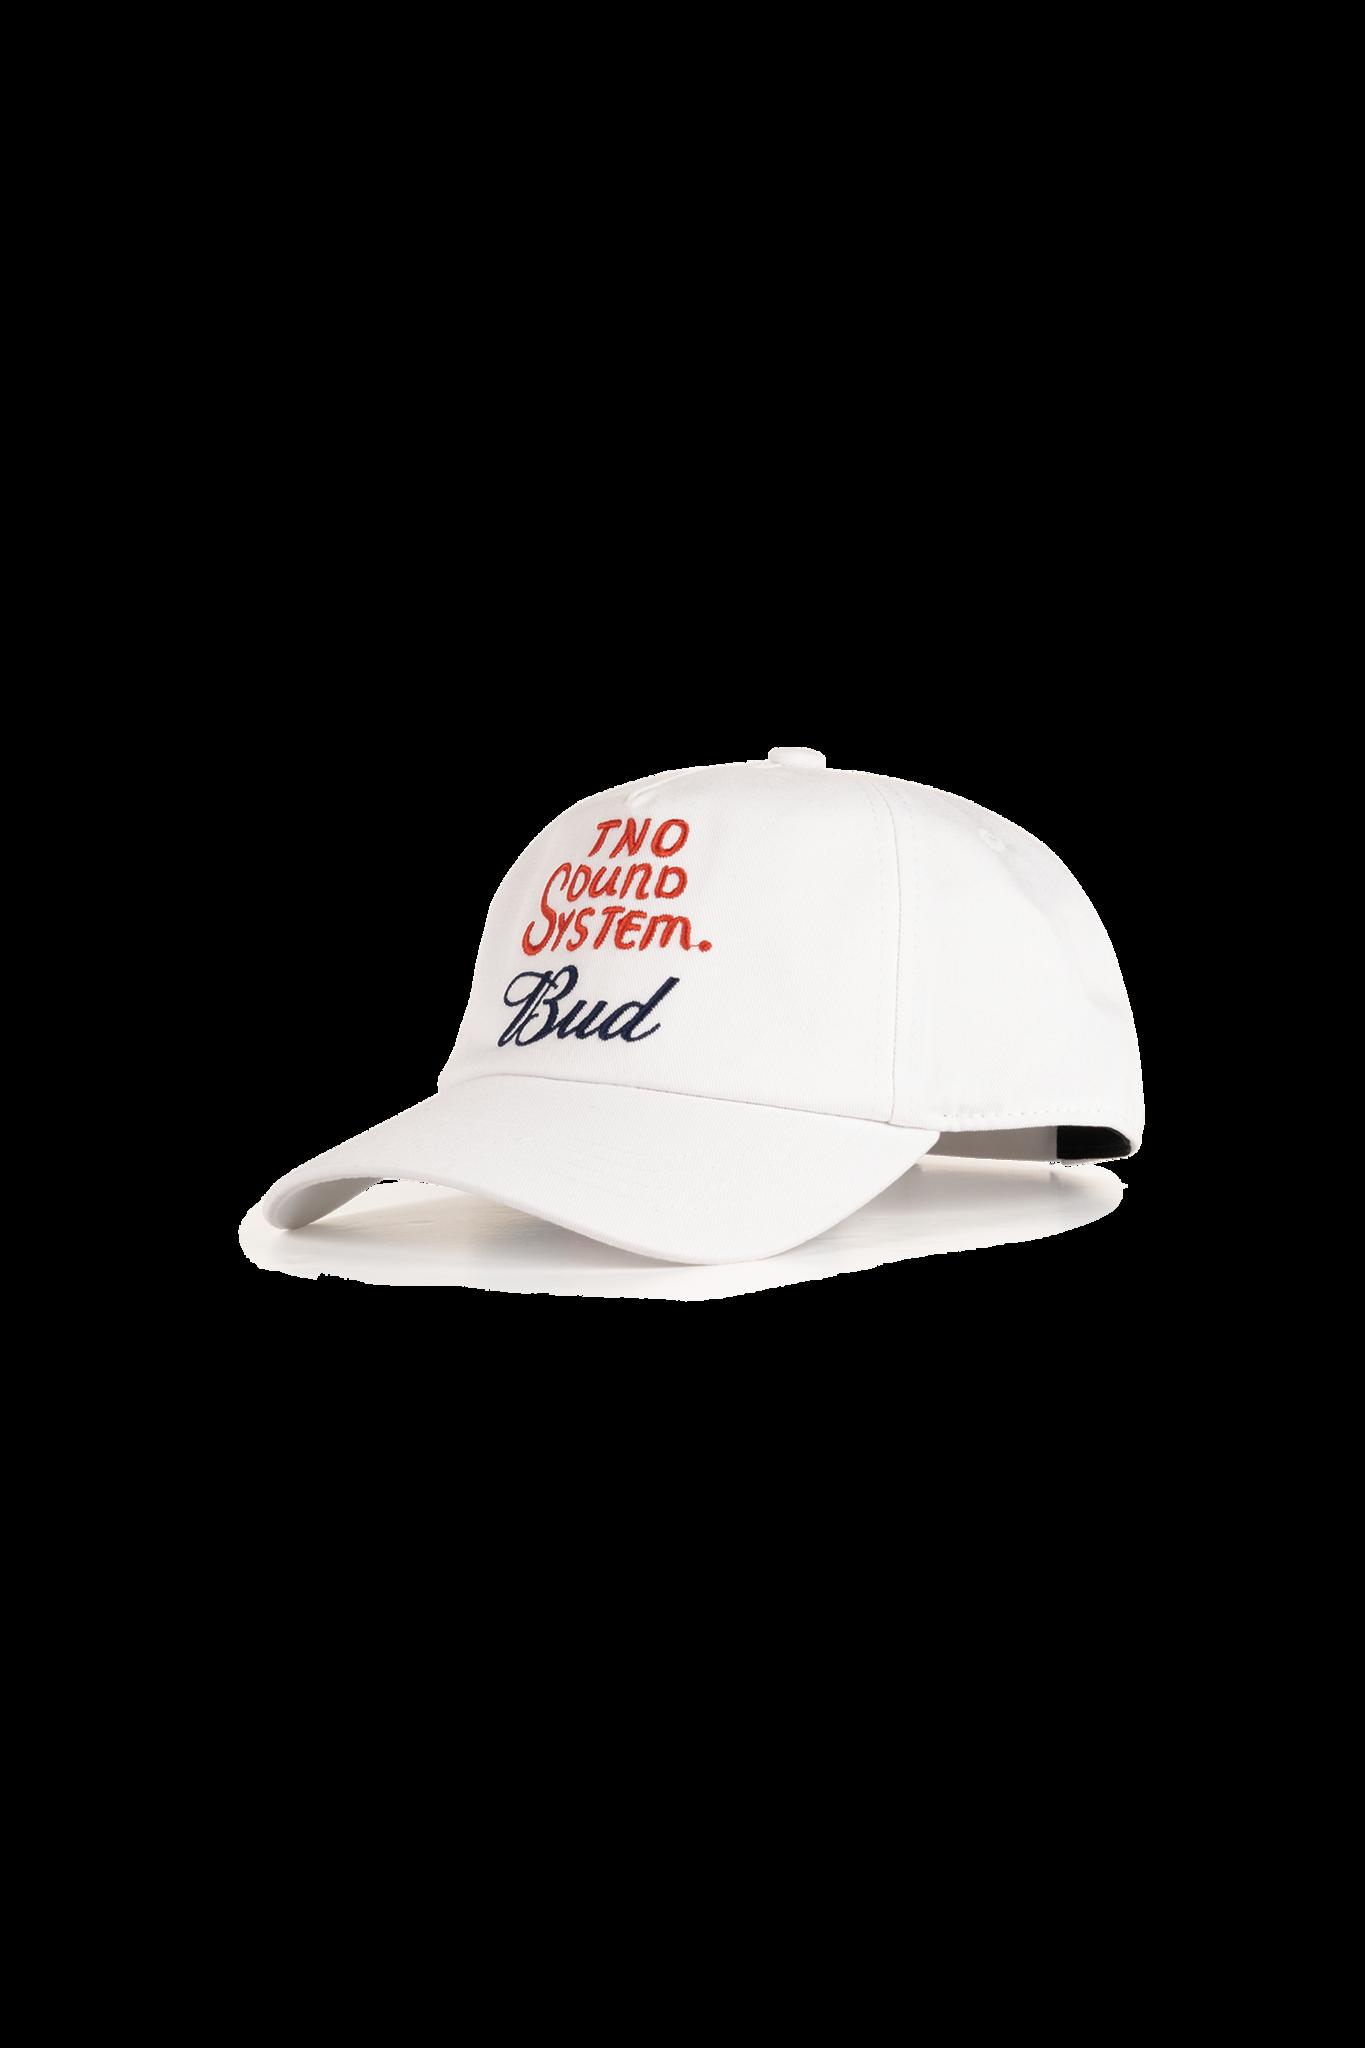 The New Originals TNO Soundsystem X Bud Cap | White